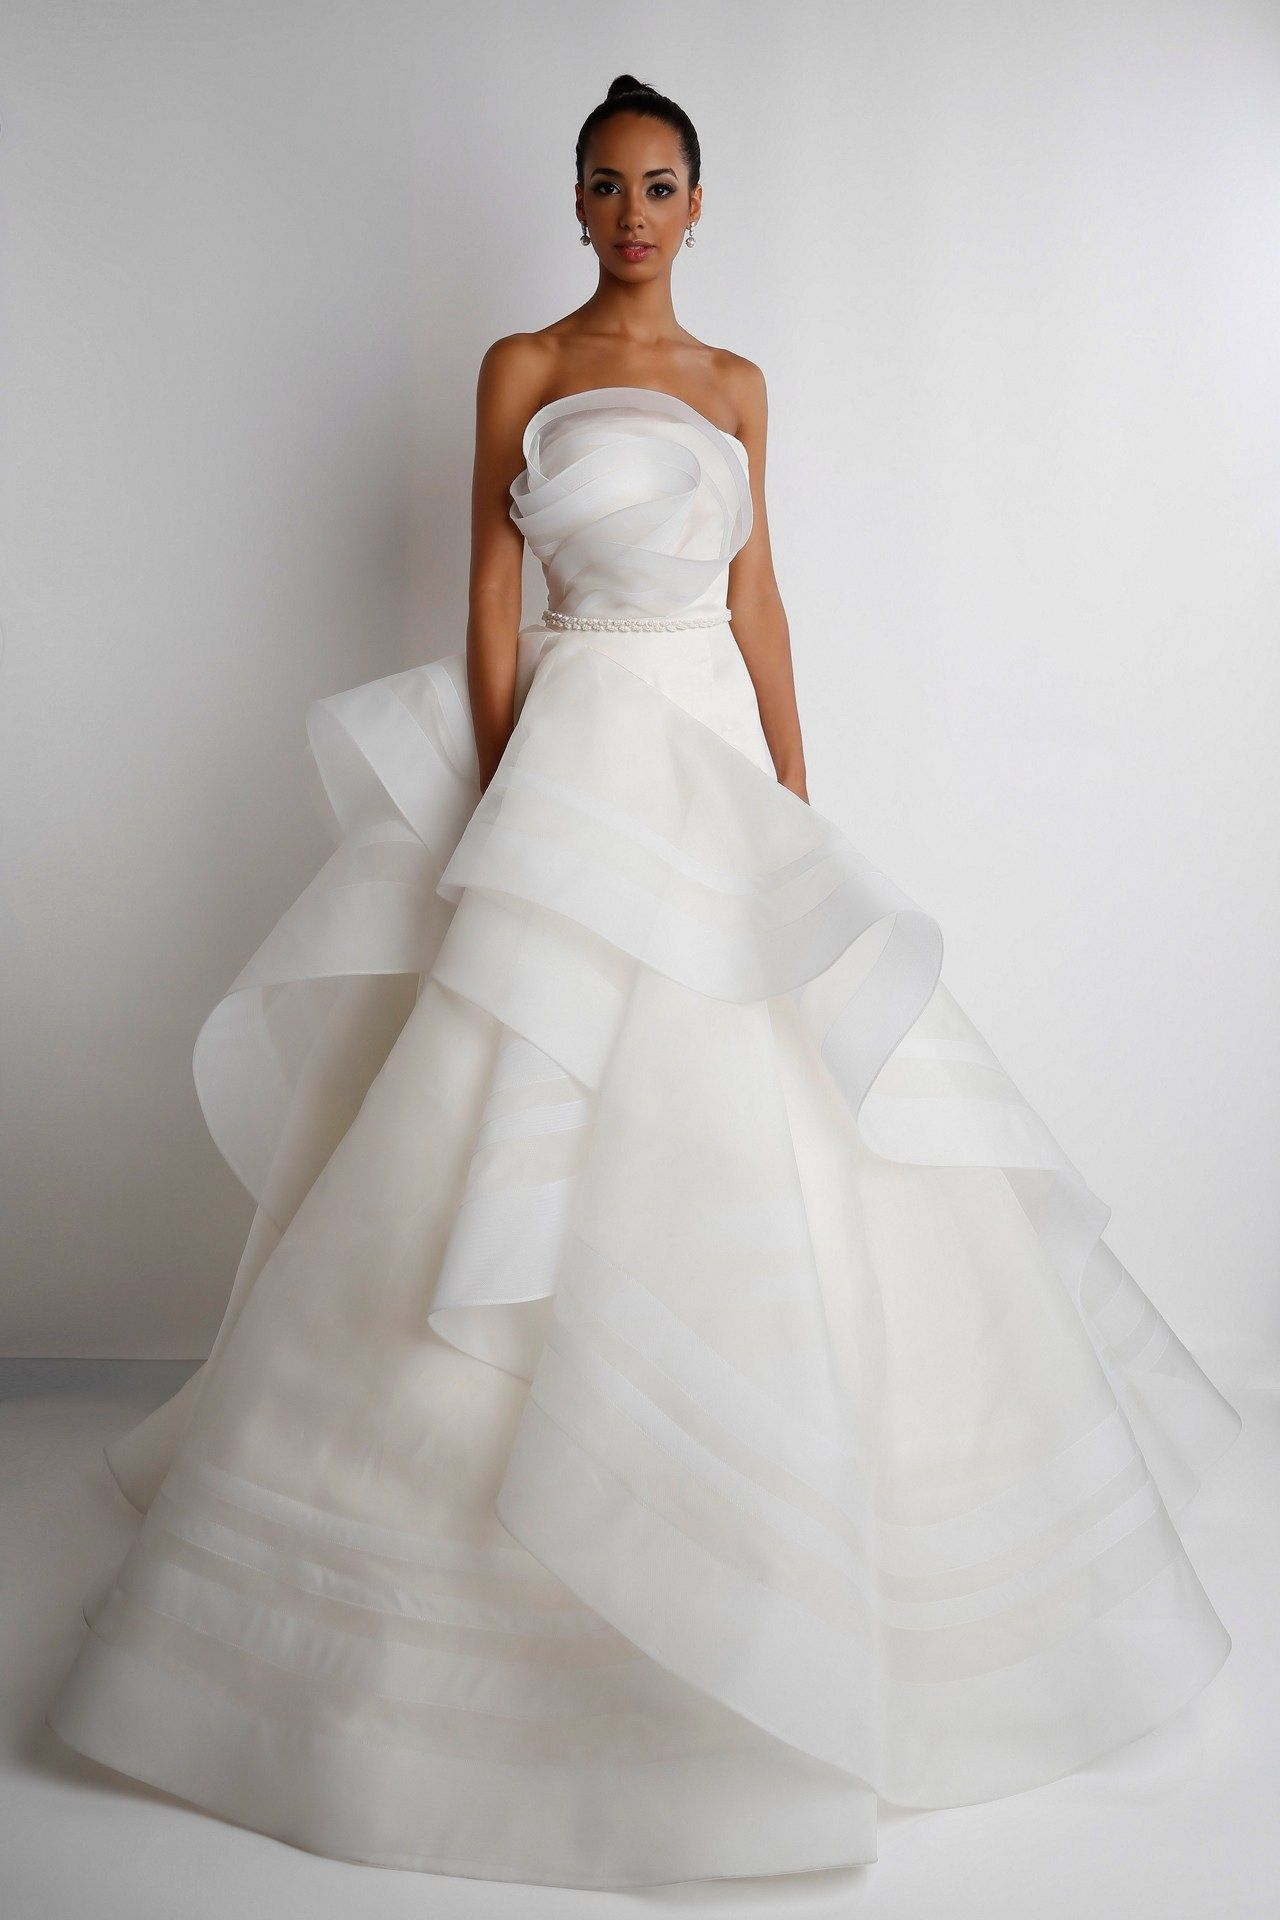 Rafael cennamo wedding dresses wedding dress designers and weddings best designer wedding dresses vera wang more httpbridesmagazine ombrellifo Choice Image